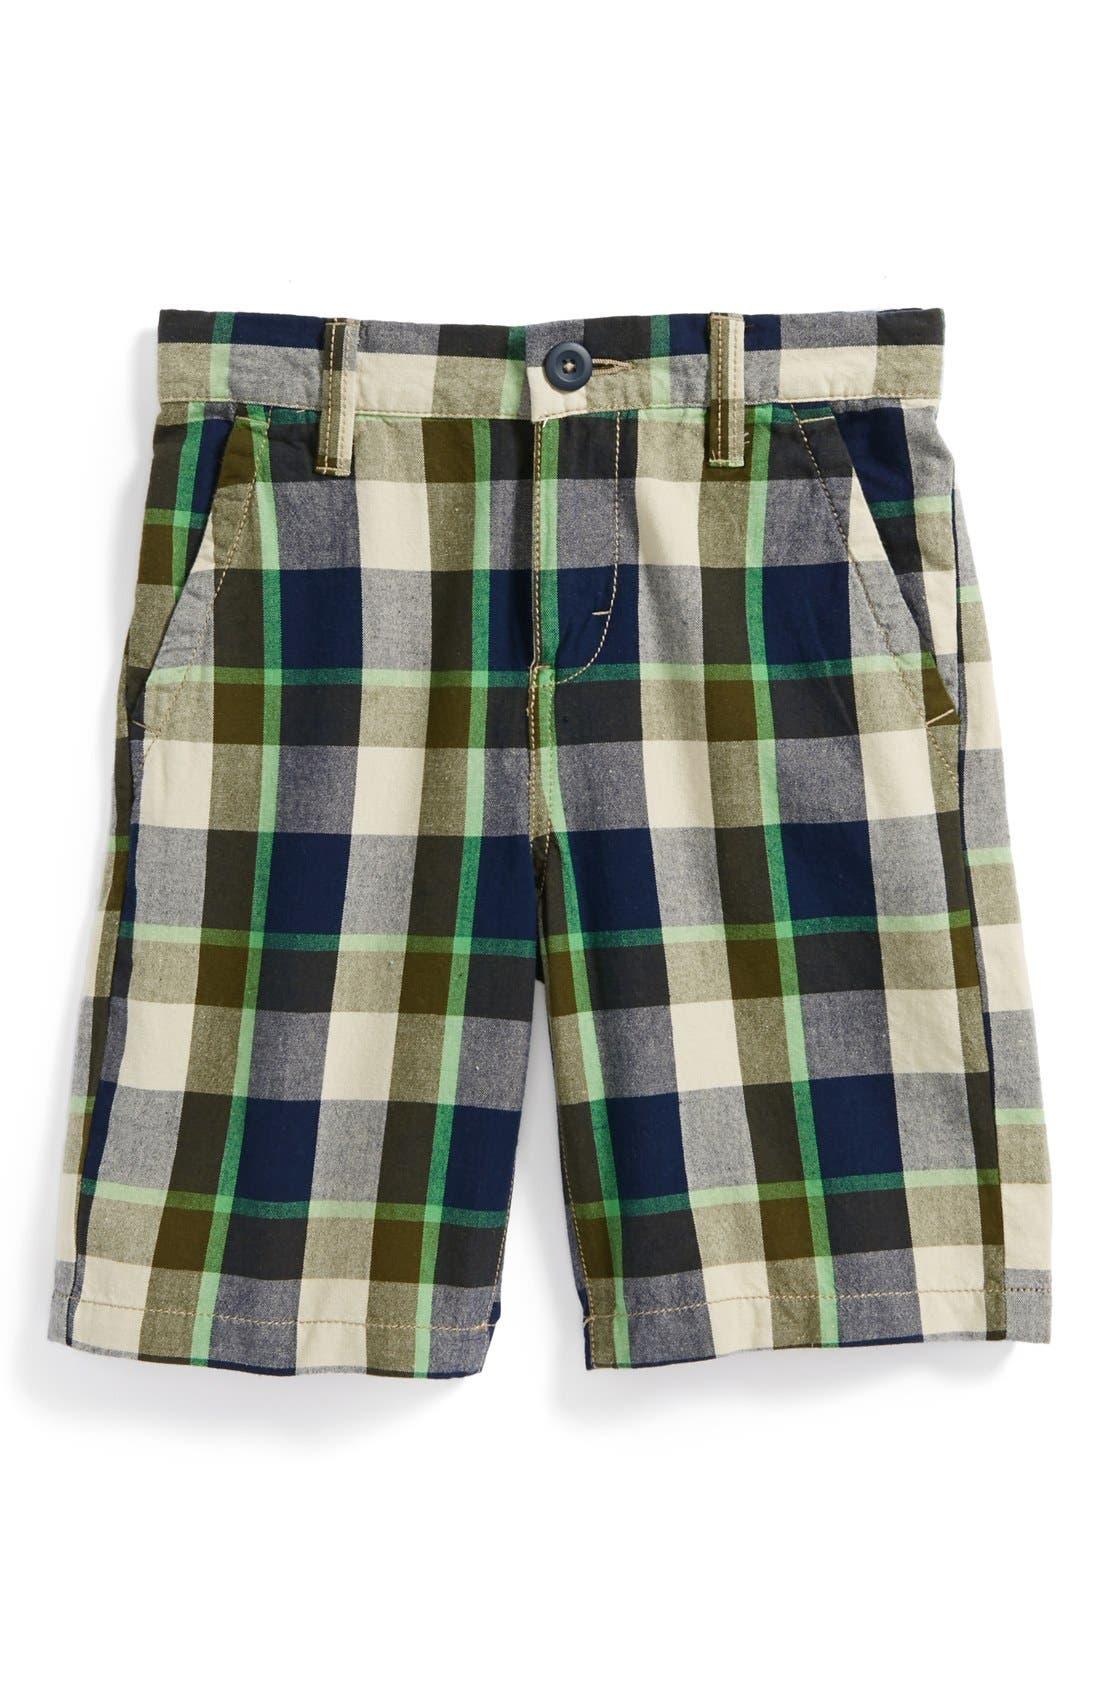 Alternate Image 1 Selected - Tucker + Tate 'Arthur' Shorts (Little Boys)